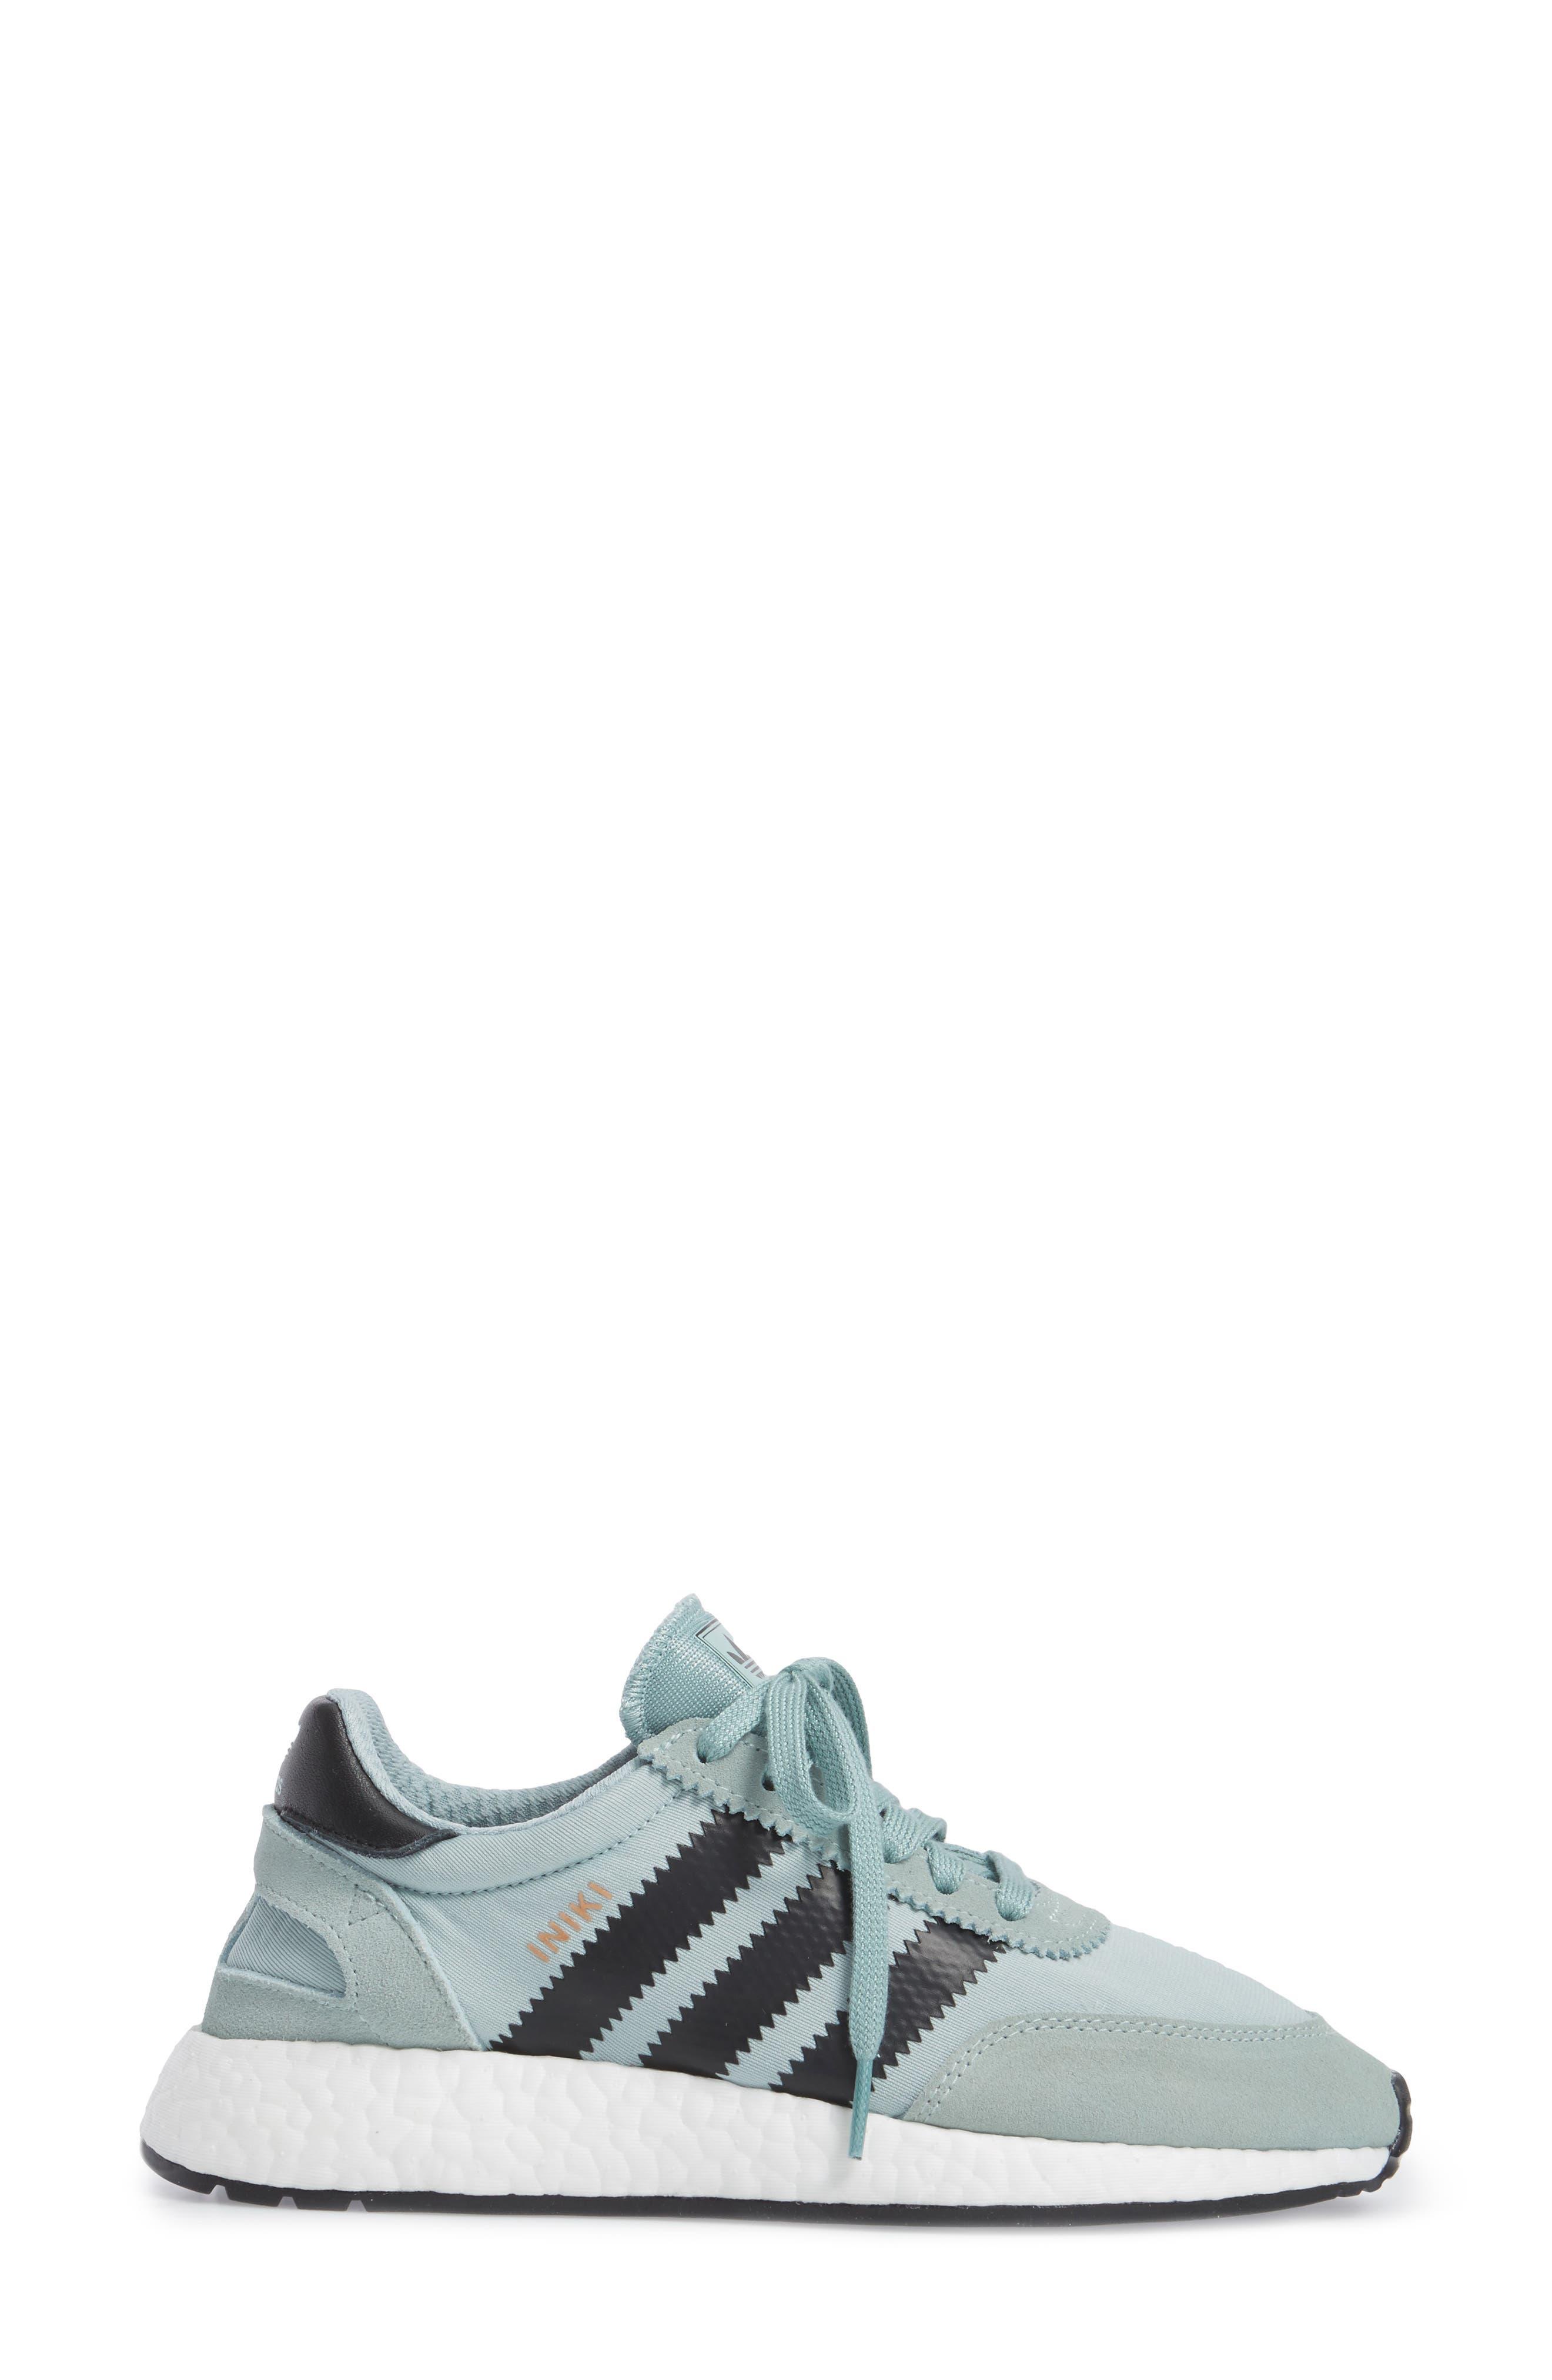 I-5923 Sneaker,                             Alternate thumbnail 3, color,                             Tactile Green/ Black/ White